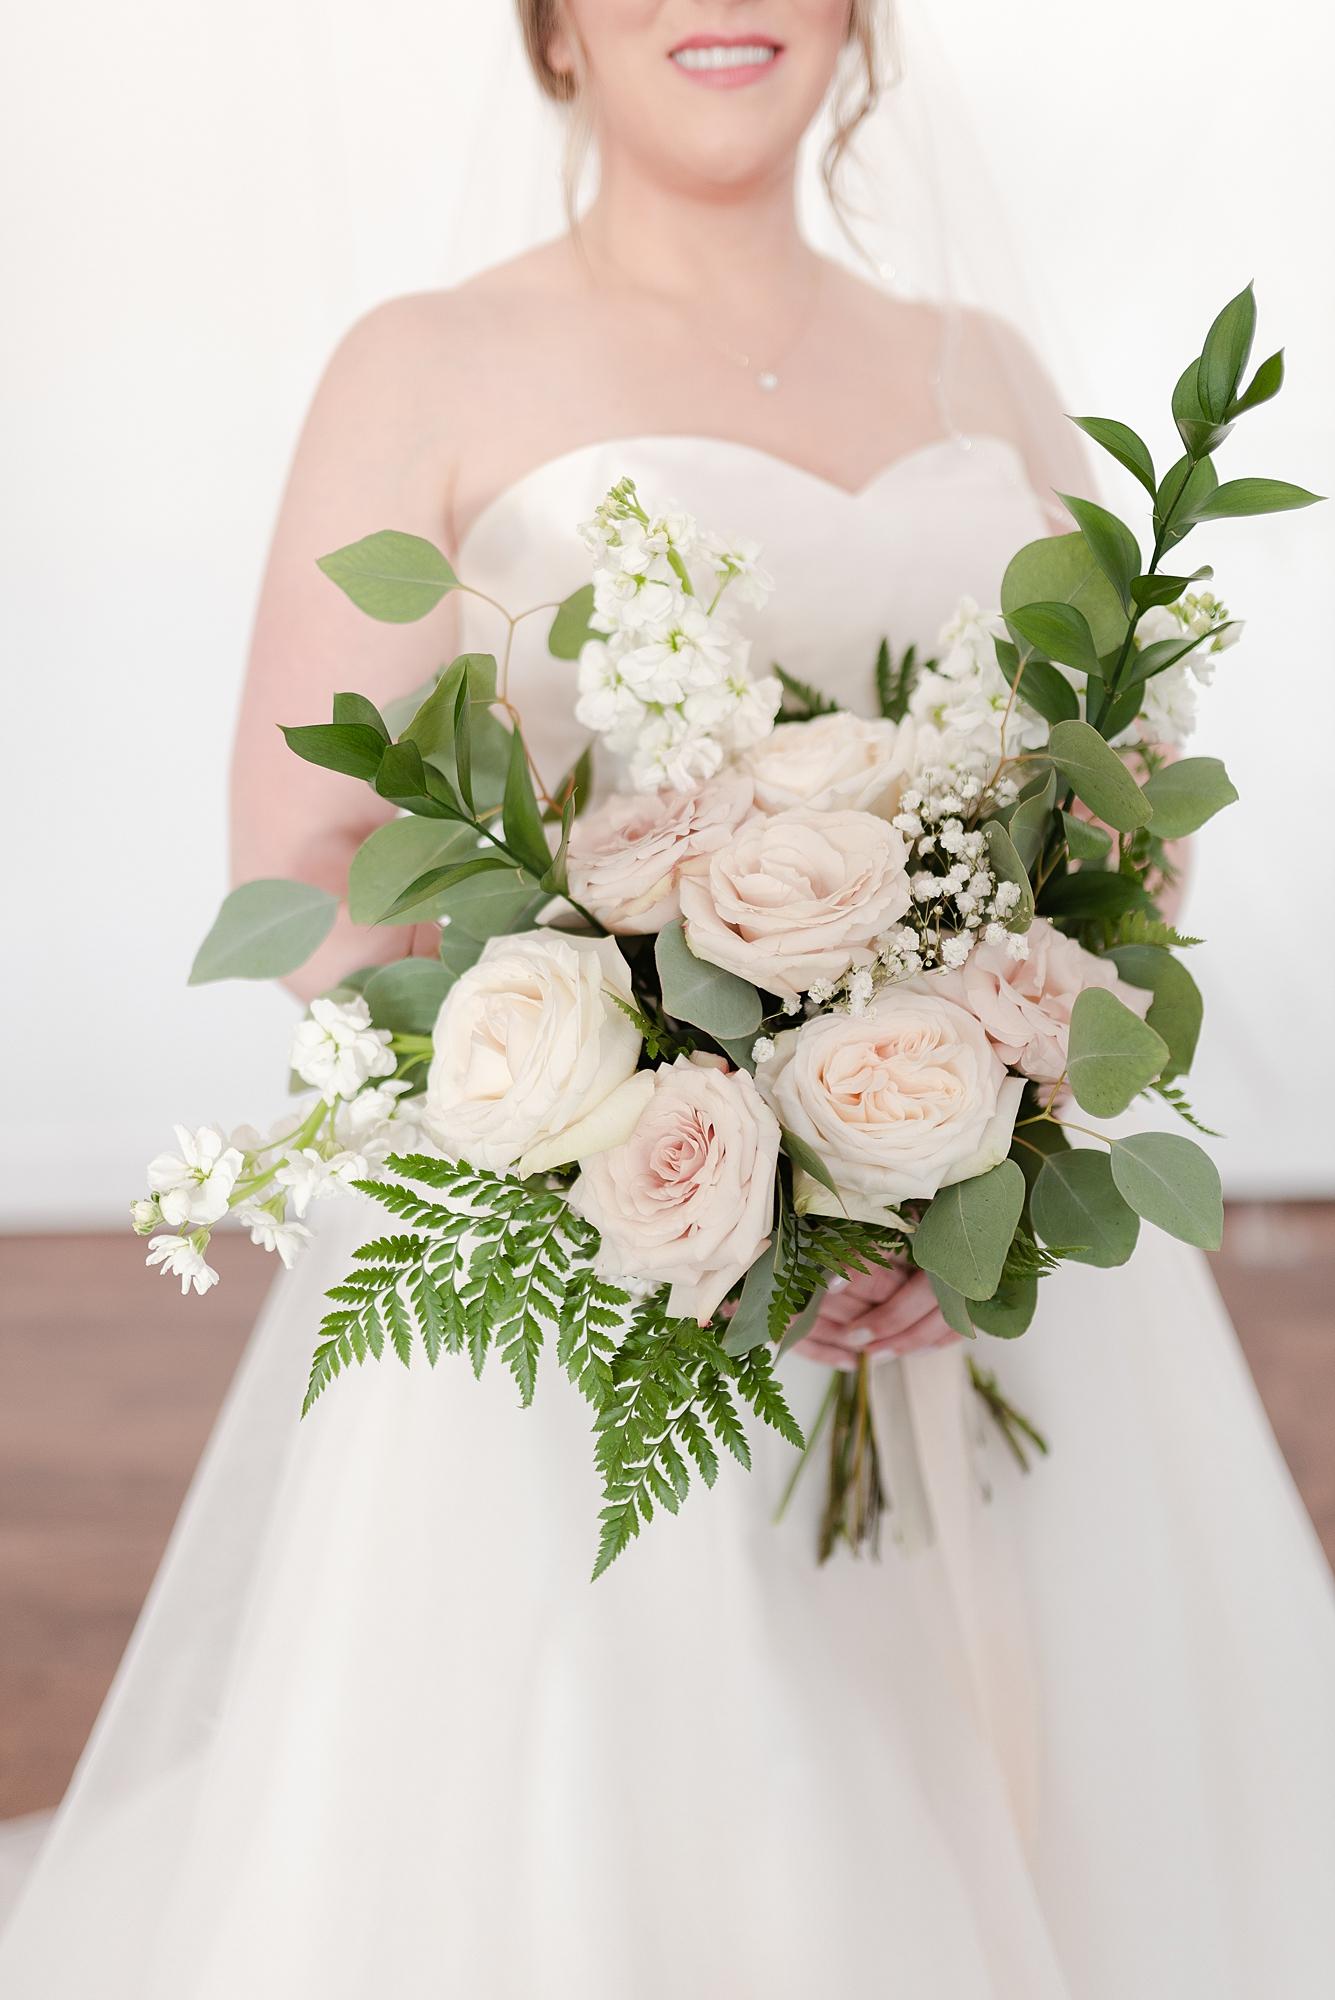 MidSummer Night's Dream Wedding Inspiration featured on Nashville Bride Guide